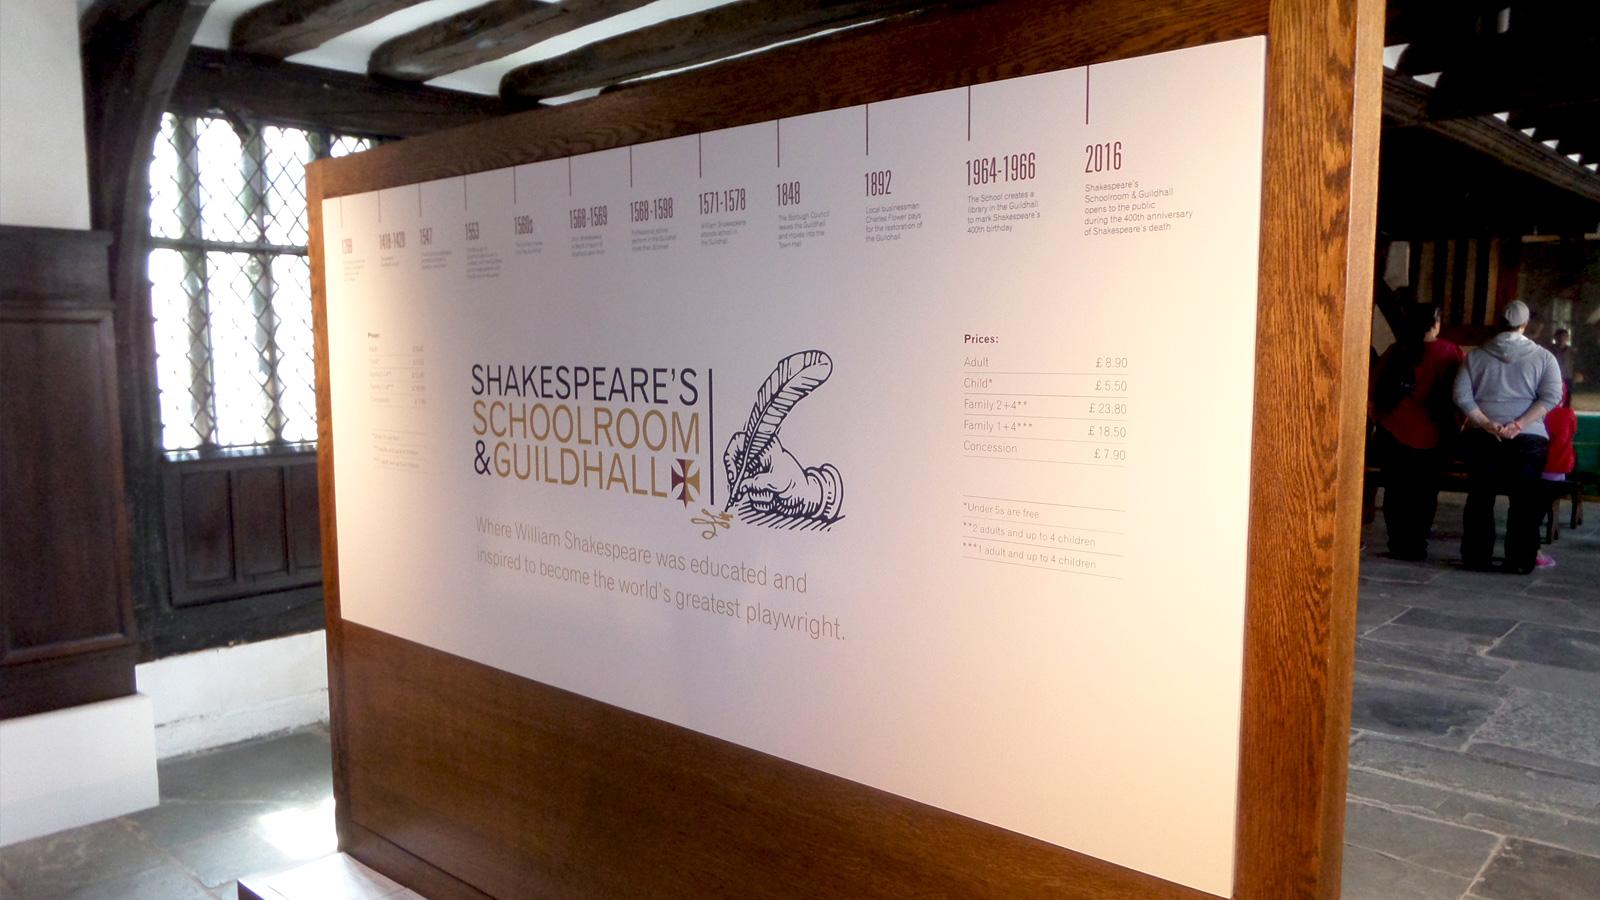 Image Makers Shakespeare's School Guildhall interpretation